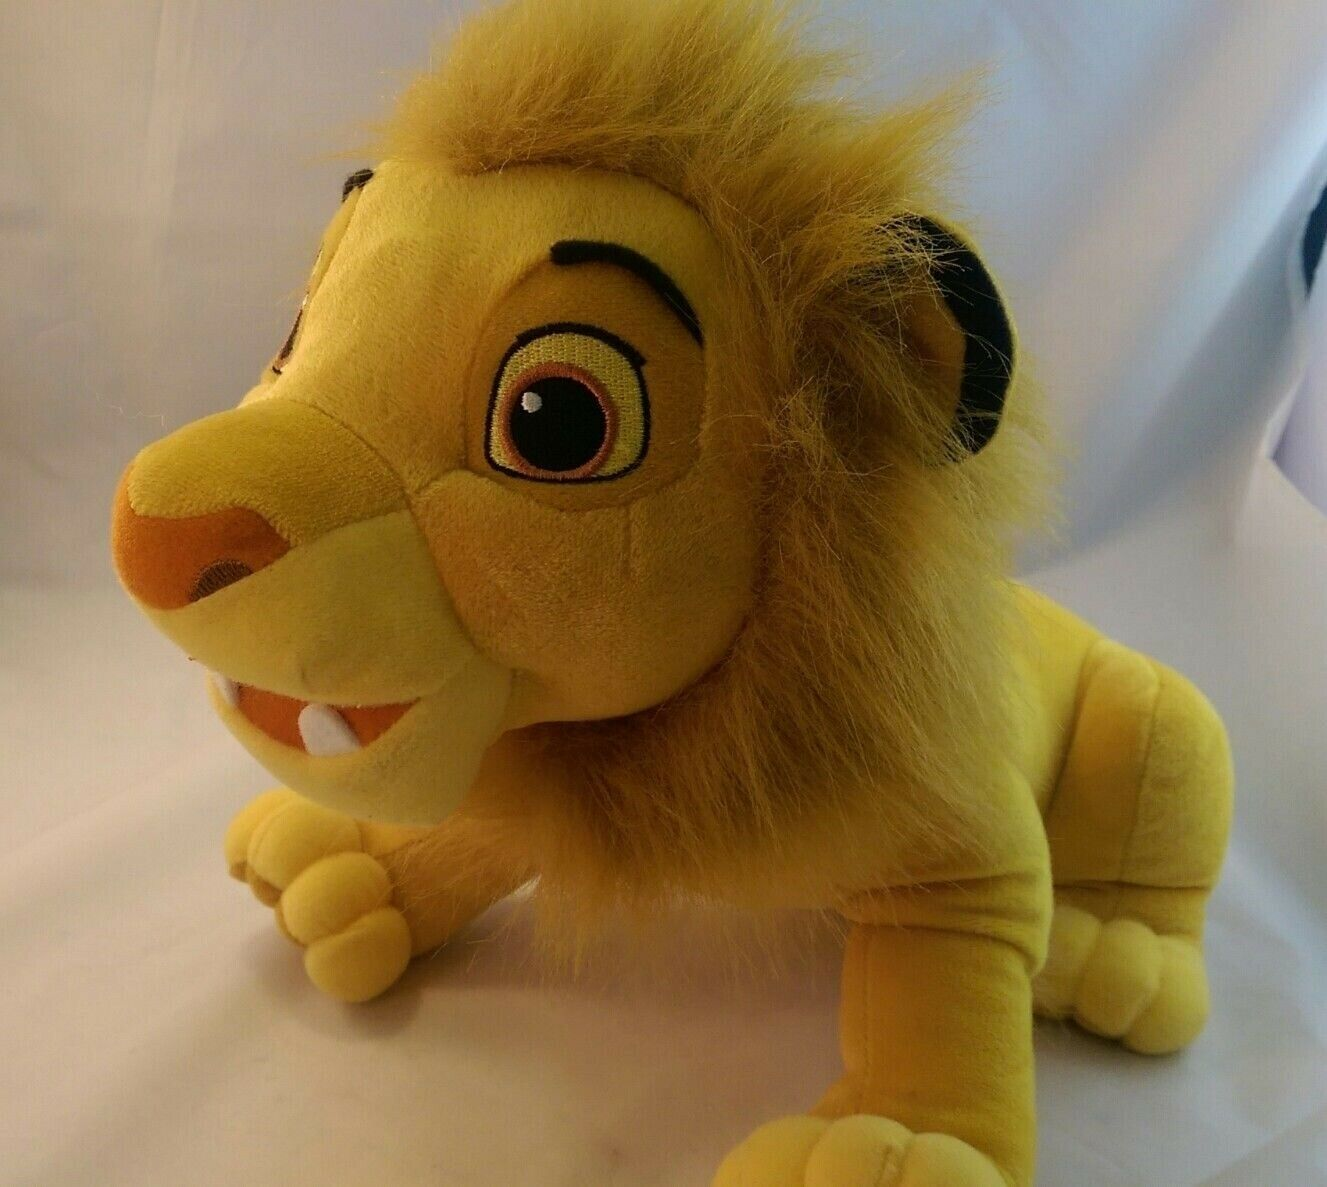 "2002 Hasbro Disney The Lion King Ready to Roar talking Simba plush toy 11""tall - $19.59"